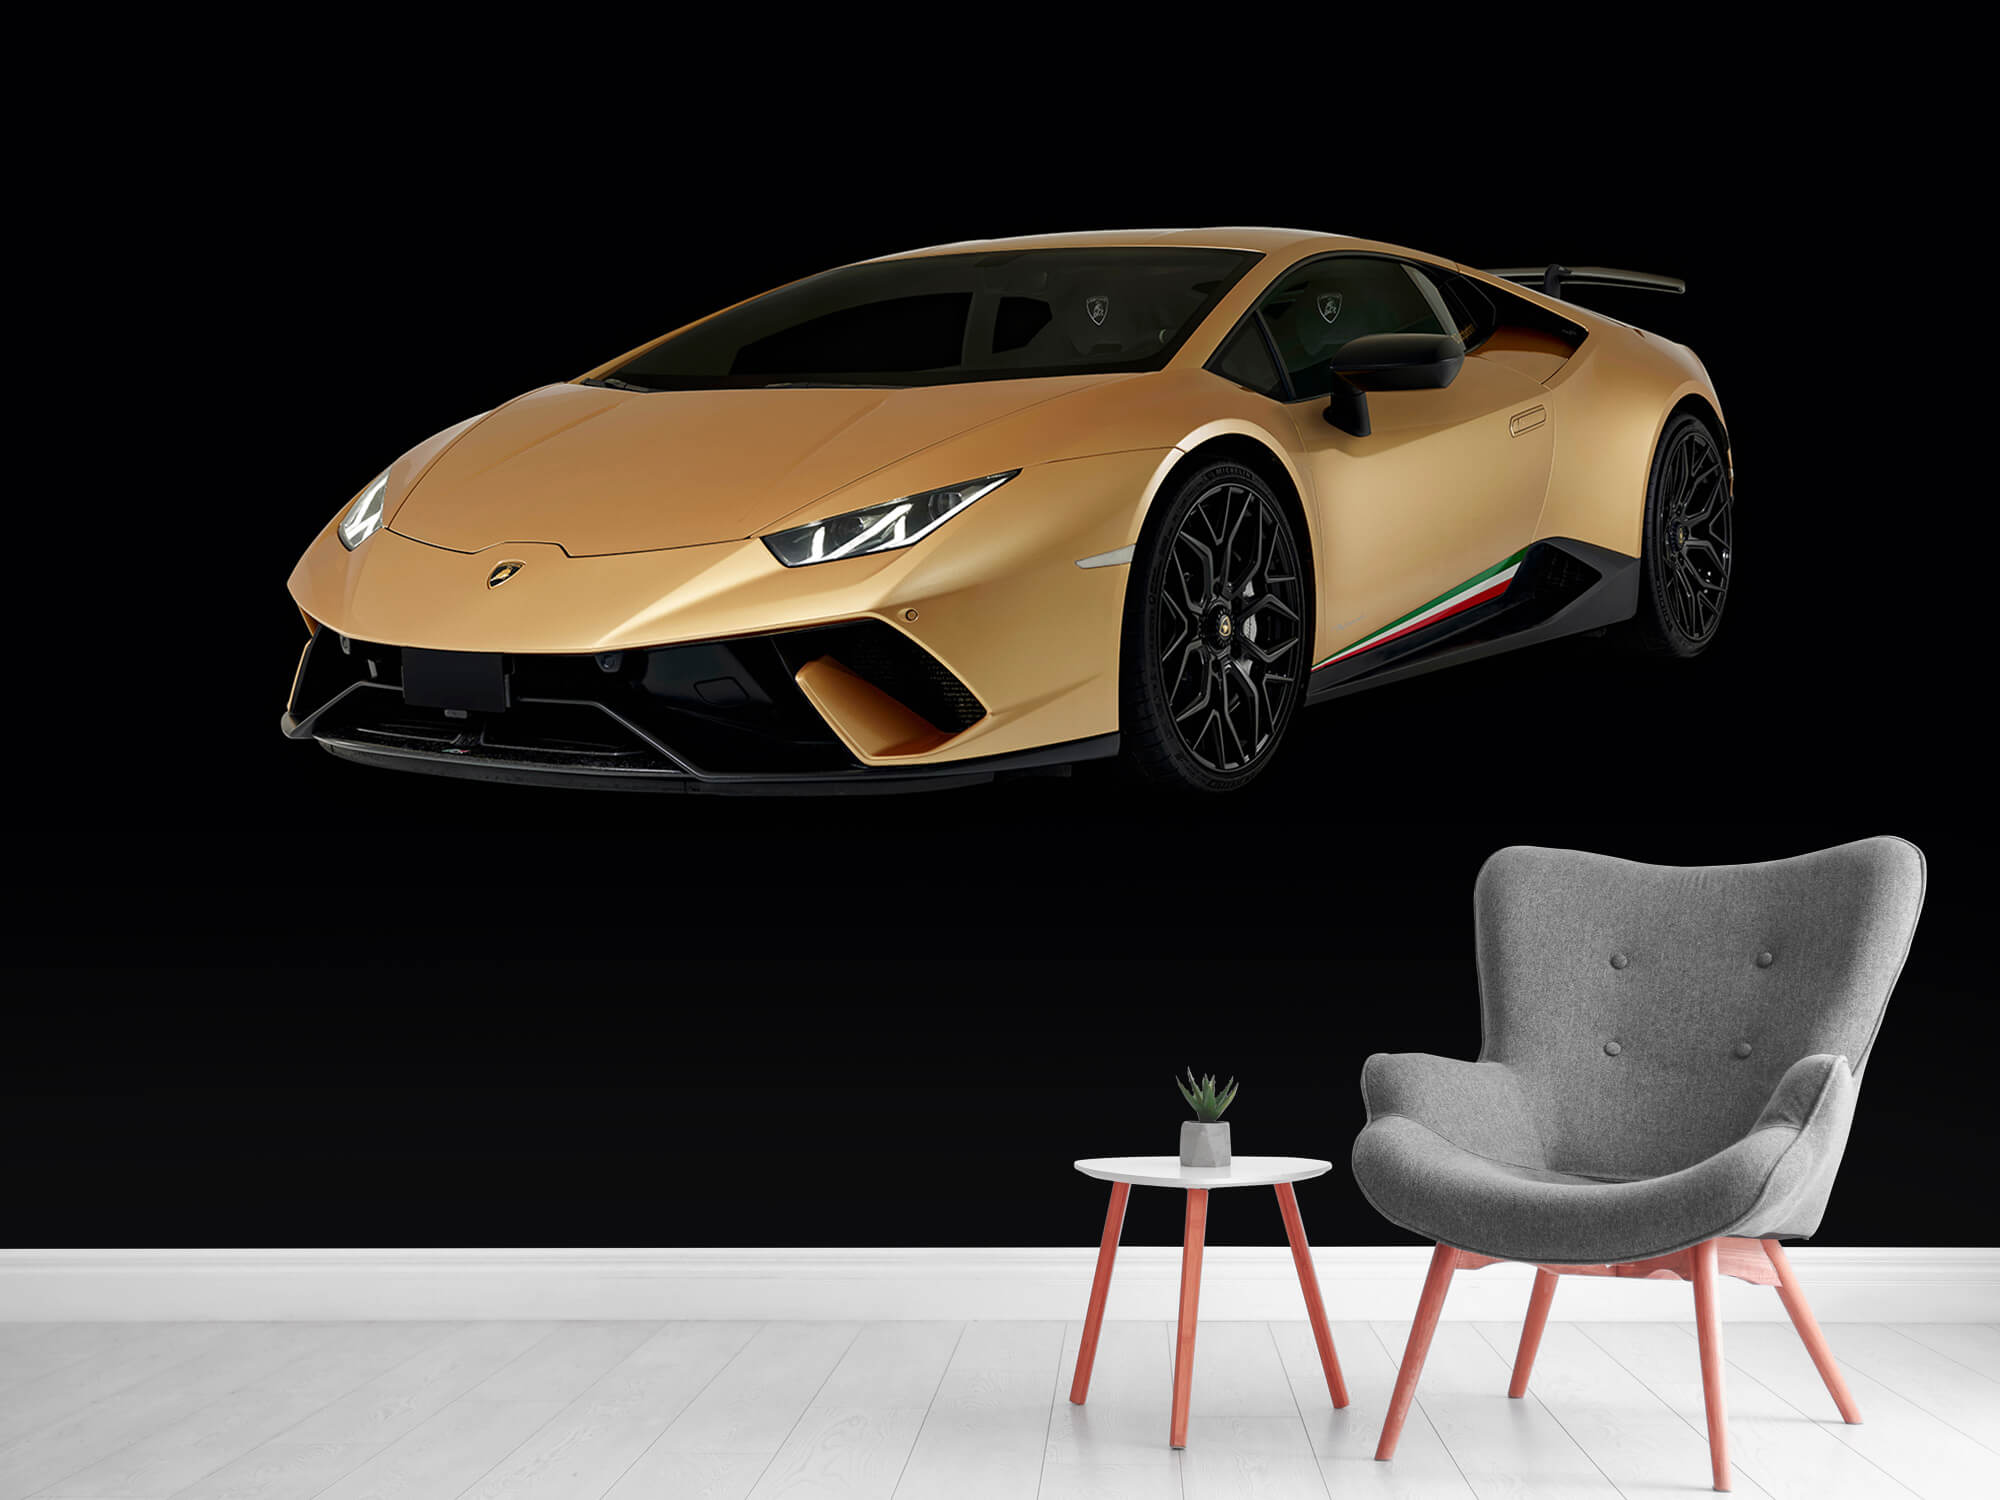 Wallpaper Lamborghini Huracán - Rechter voorkant, zwart 5